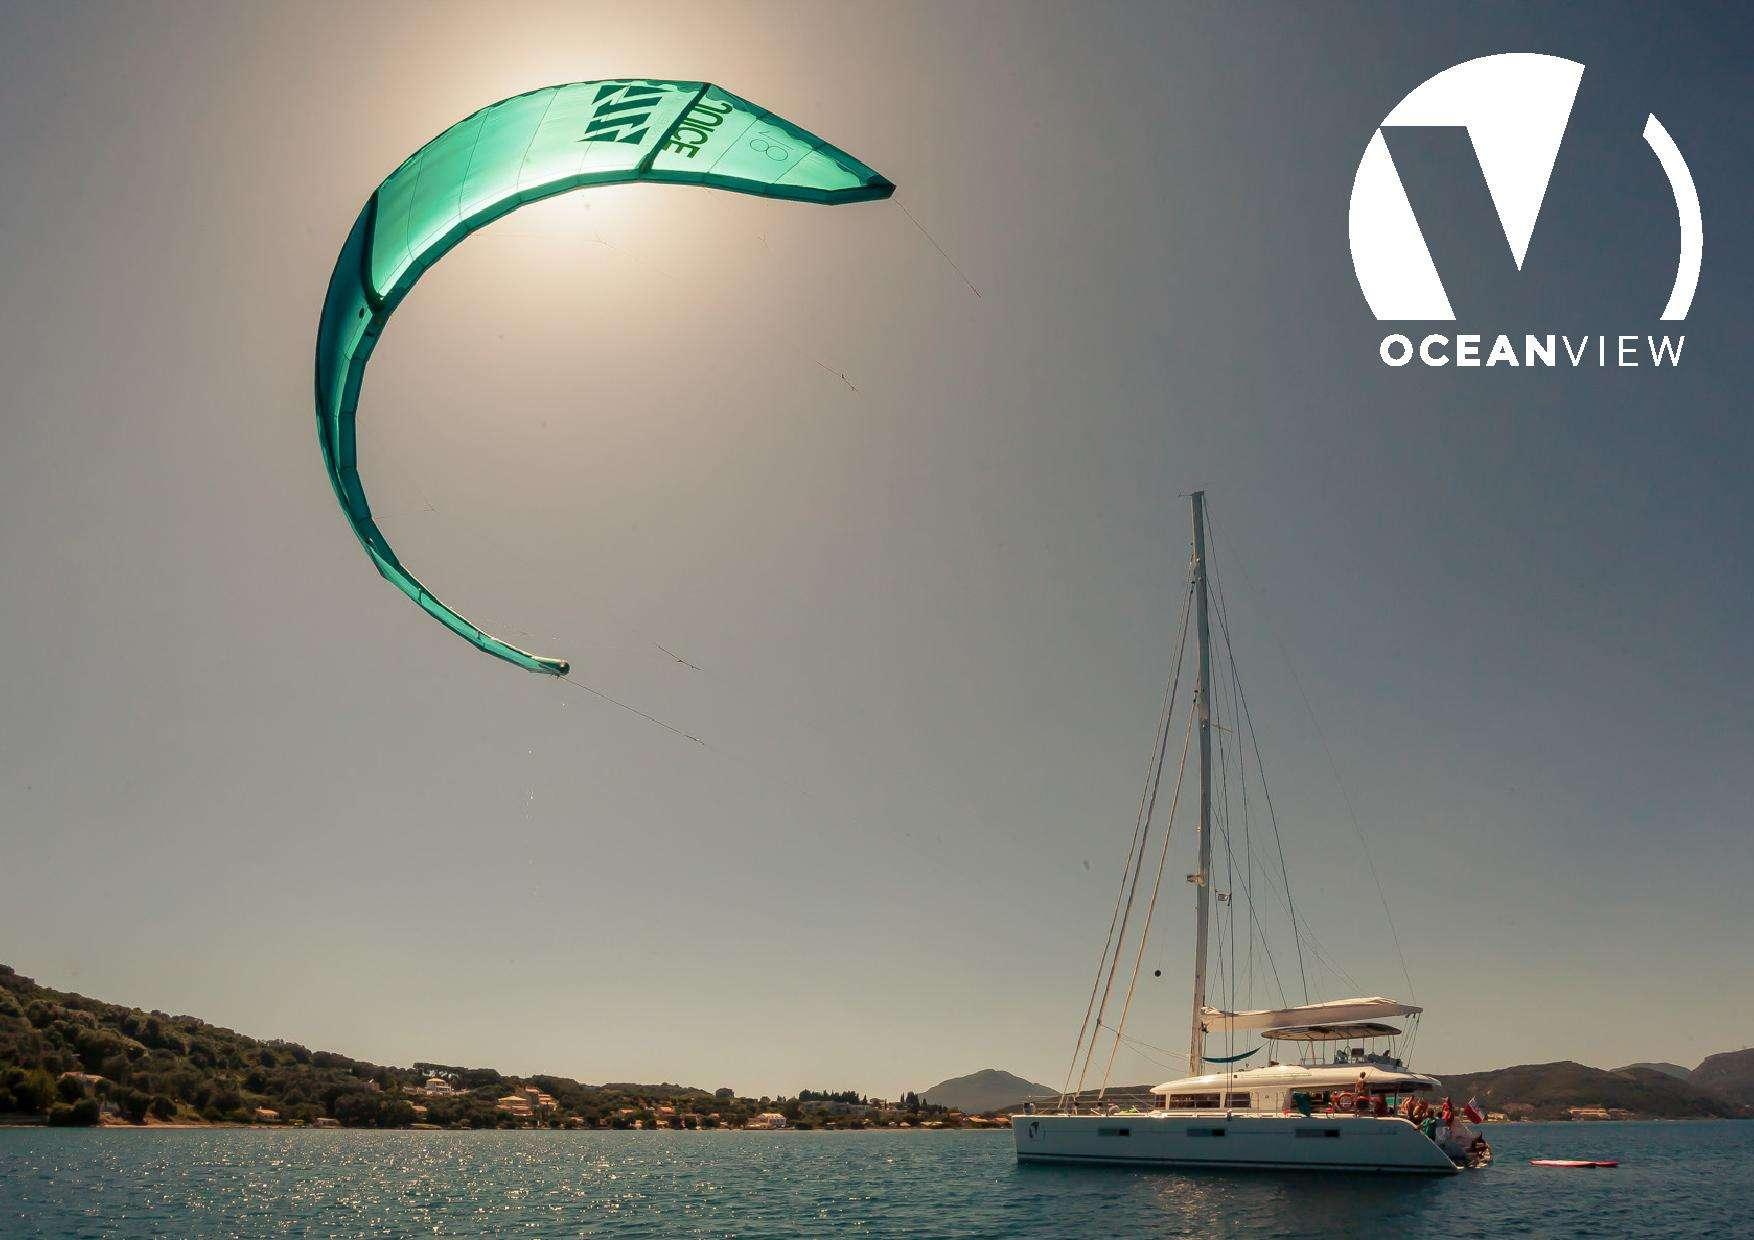 Catamaran Yacht 'OCEAN VIEW' S/Y OCEAN VIEW, 6 PAX, 2 Crew, 62.00 Ft, 18.00 Meters, Built 2014, Lagoon, Refit Year 2016